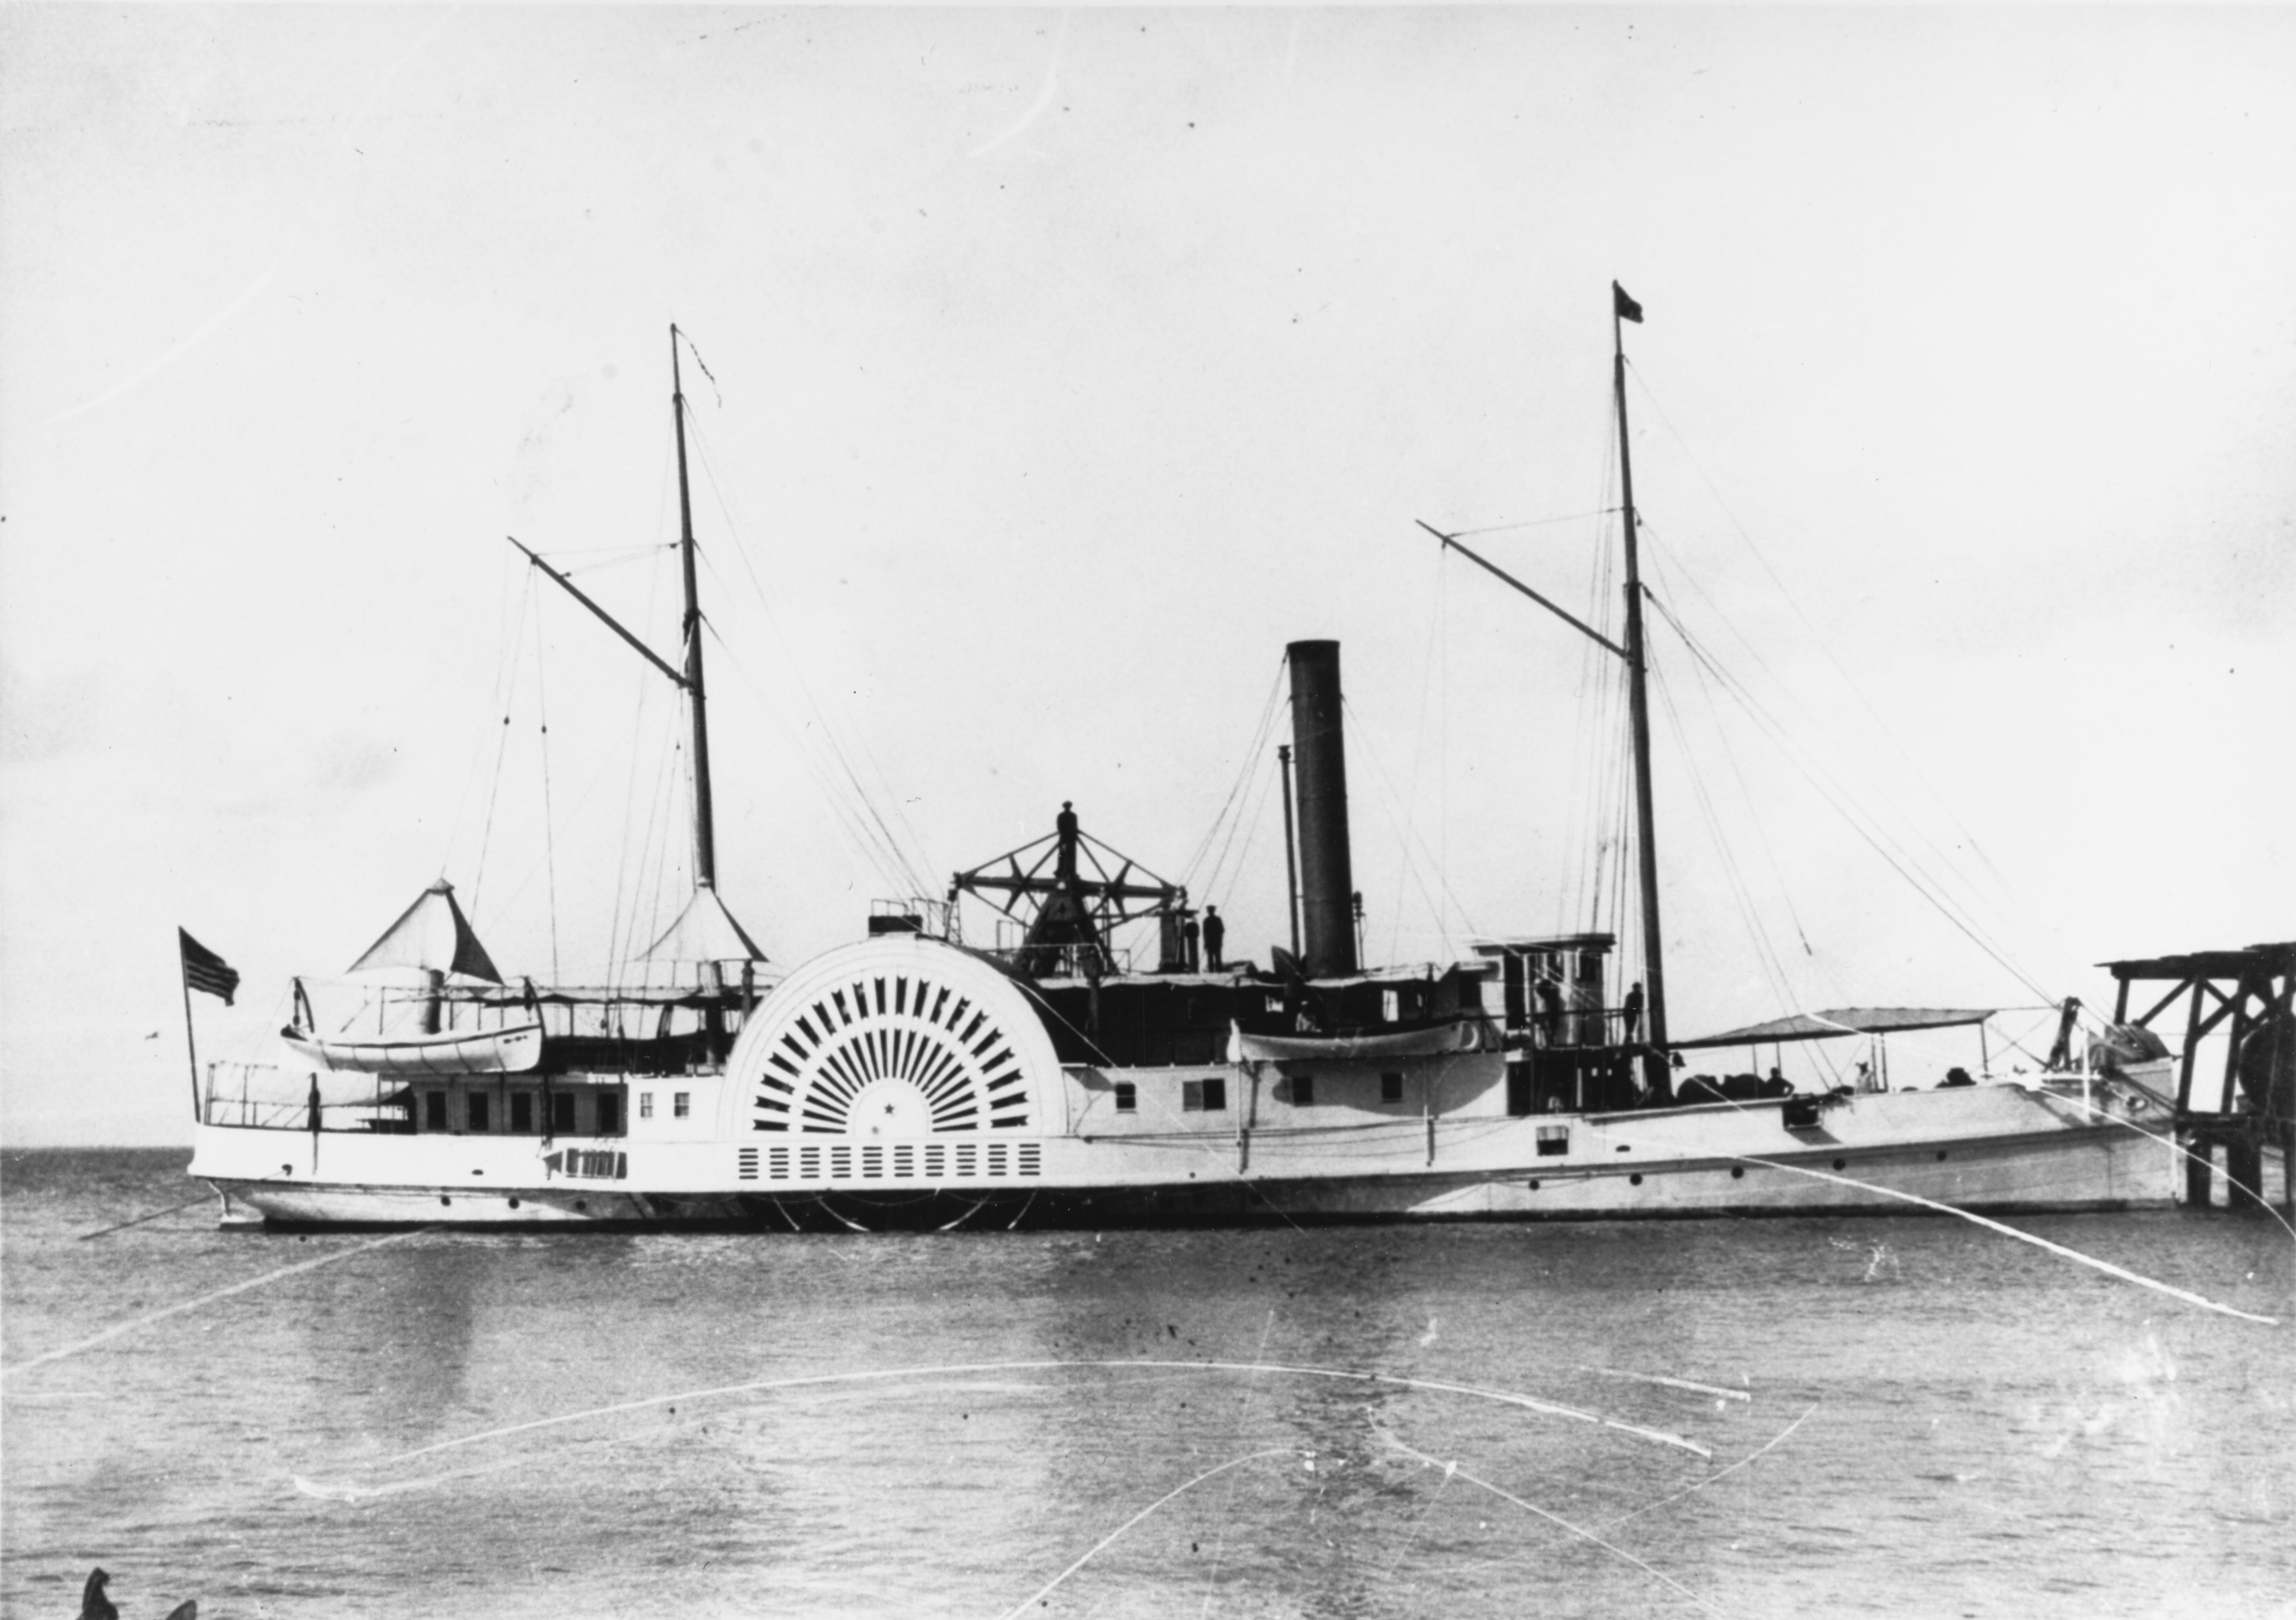 https://upload.wikimedia.org/wikipedia/commons/f/f1/USS_Delaware_%281861%29.jpg